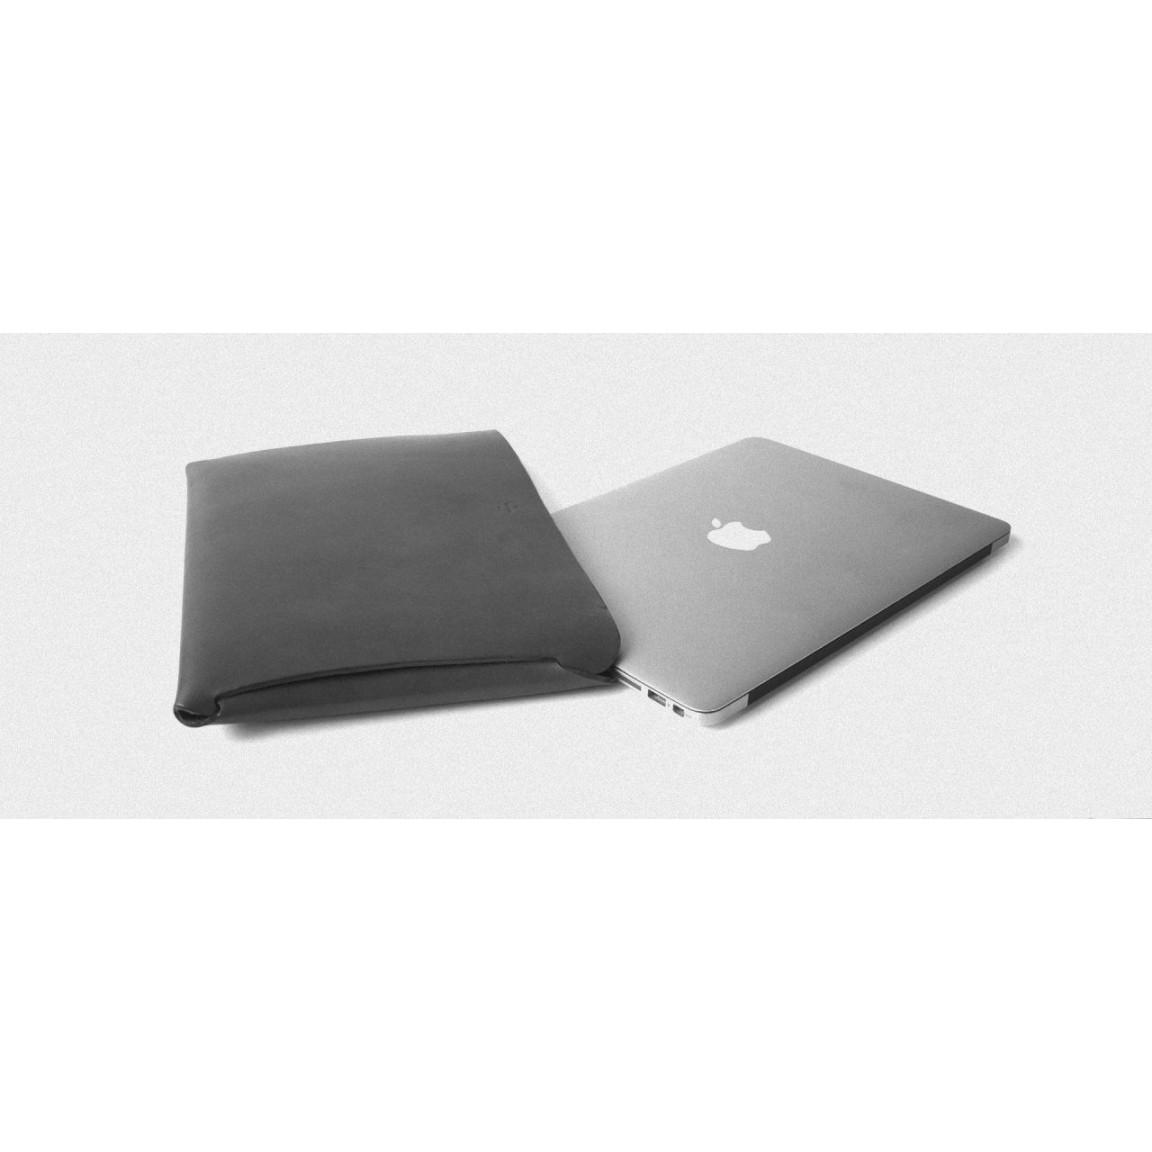 Macbook Tab Media Case | Chestnut